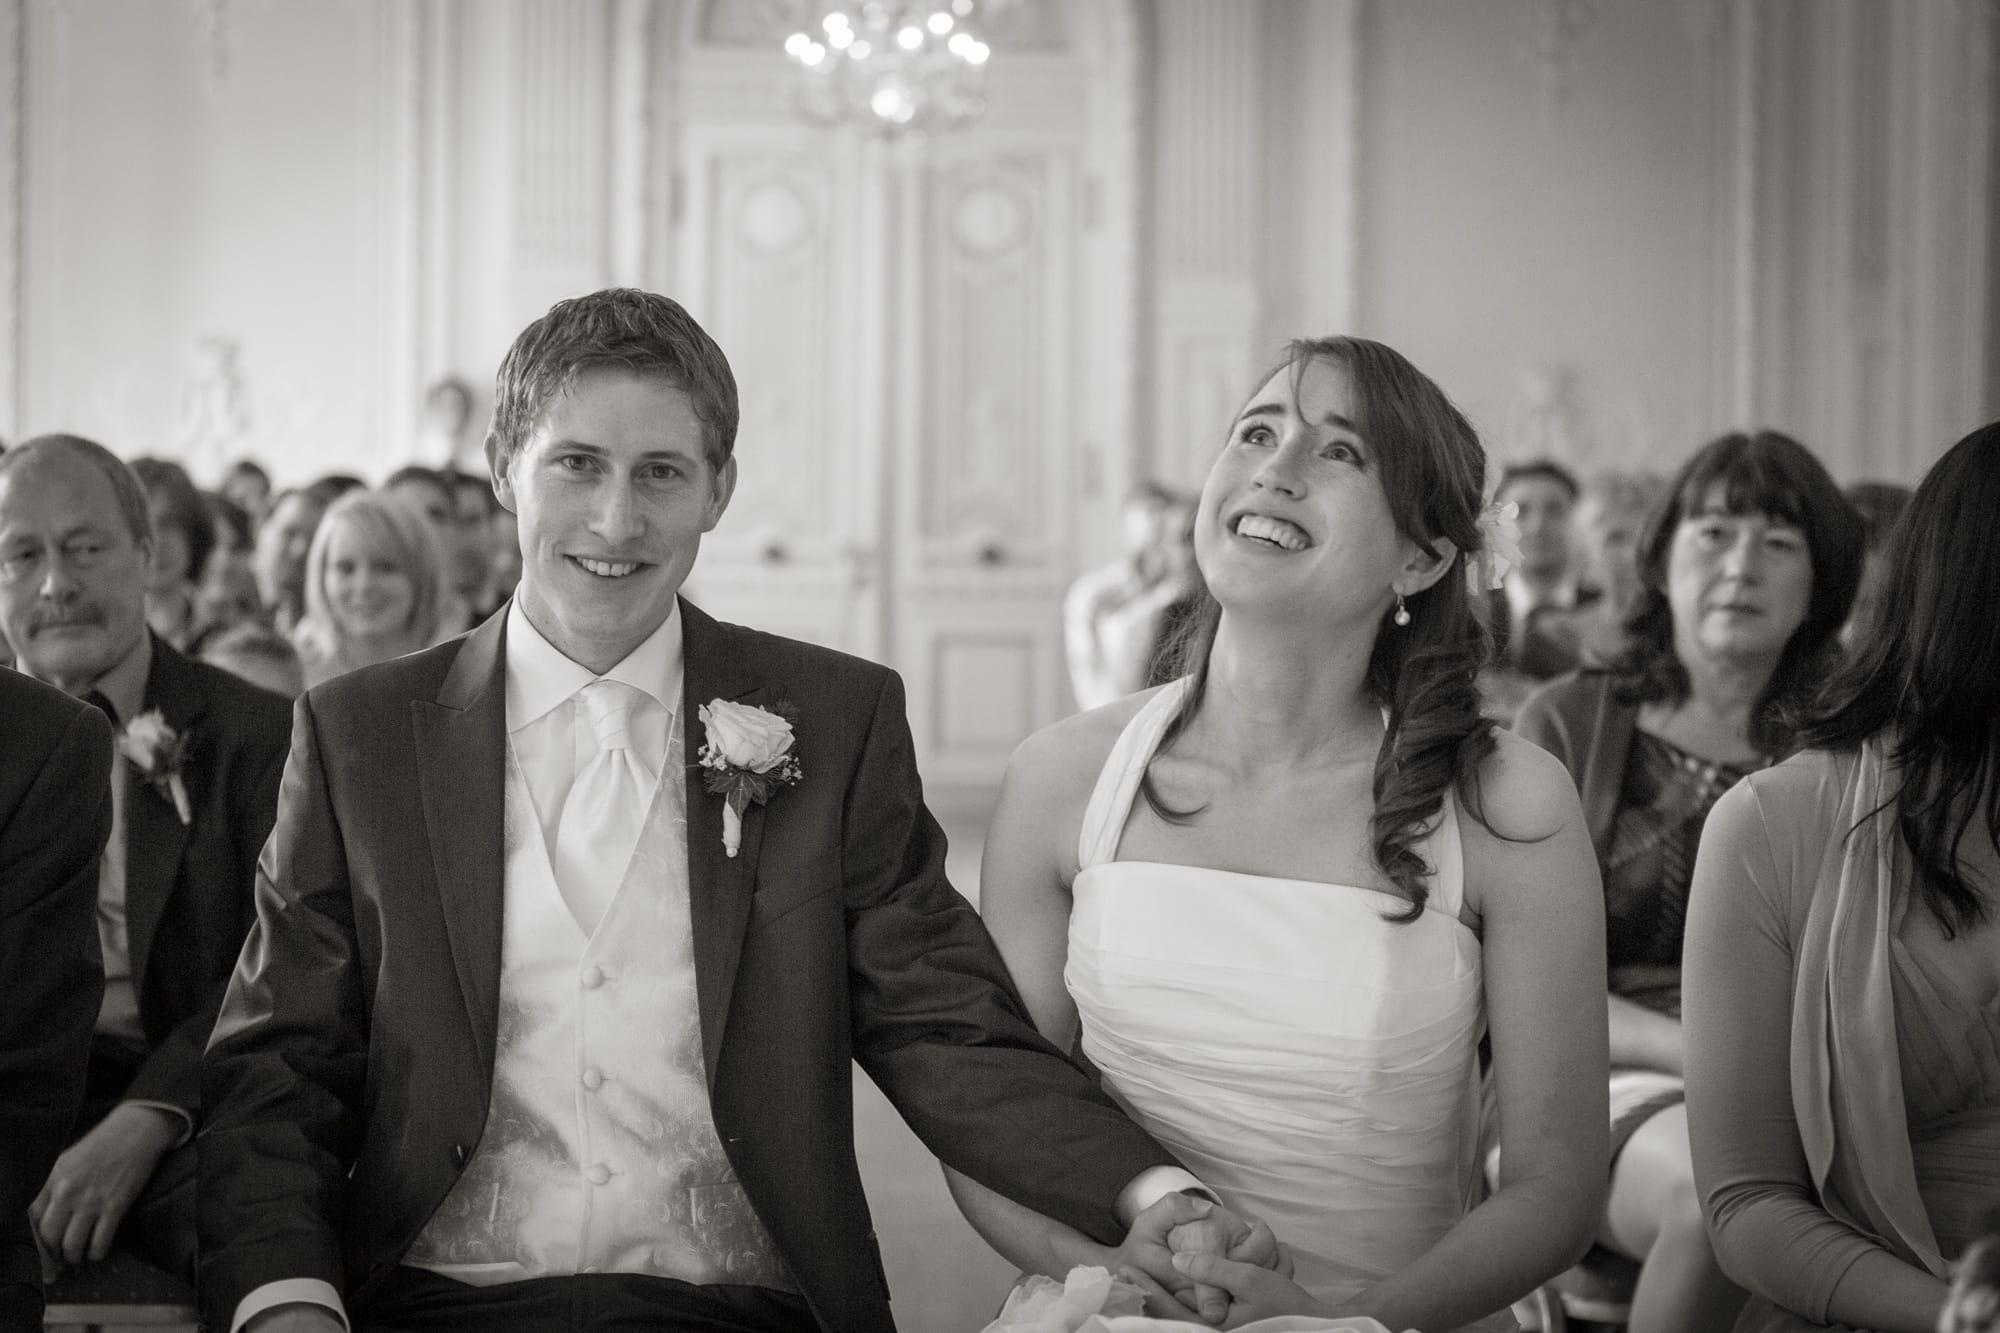 querformat-fotografie - Achim Katzberg - Hochzeiten - Zeremonie - querformat-fotografie_Hochzeiten_Trauung-005